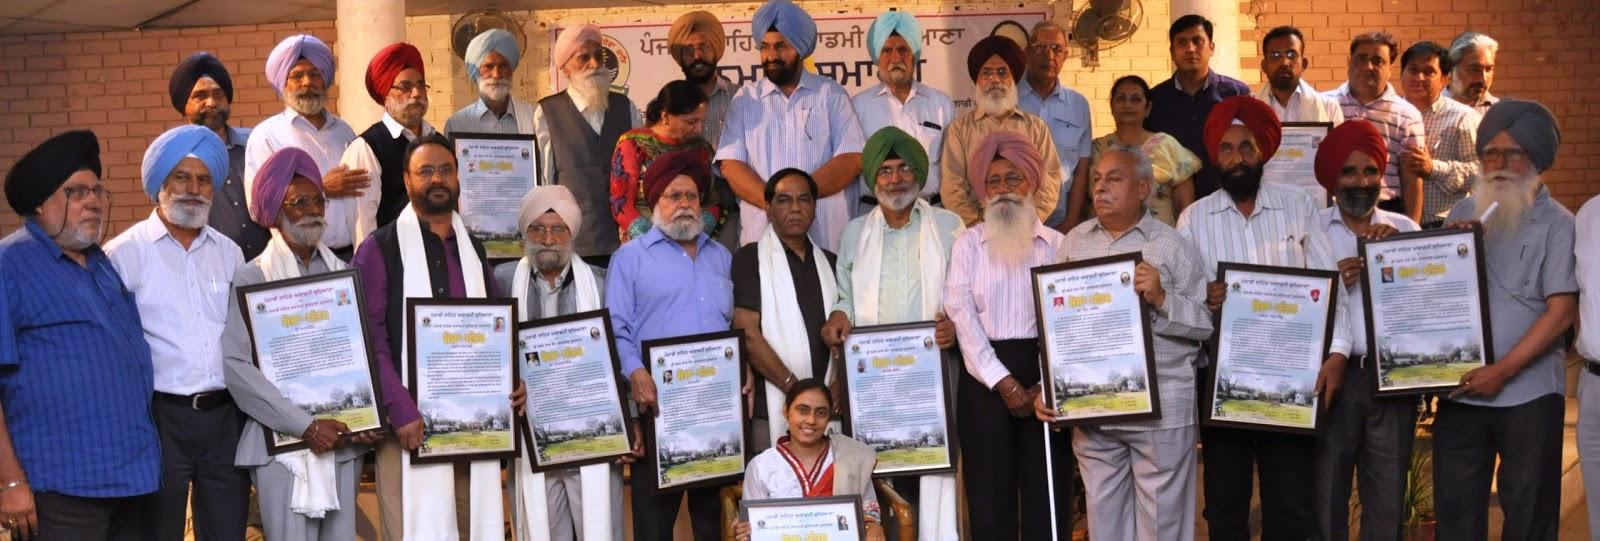 punjabi writers awarded surjit patar inderjit nandan mohanjit, trailochan lochi